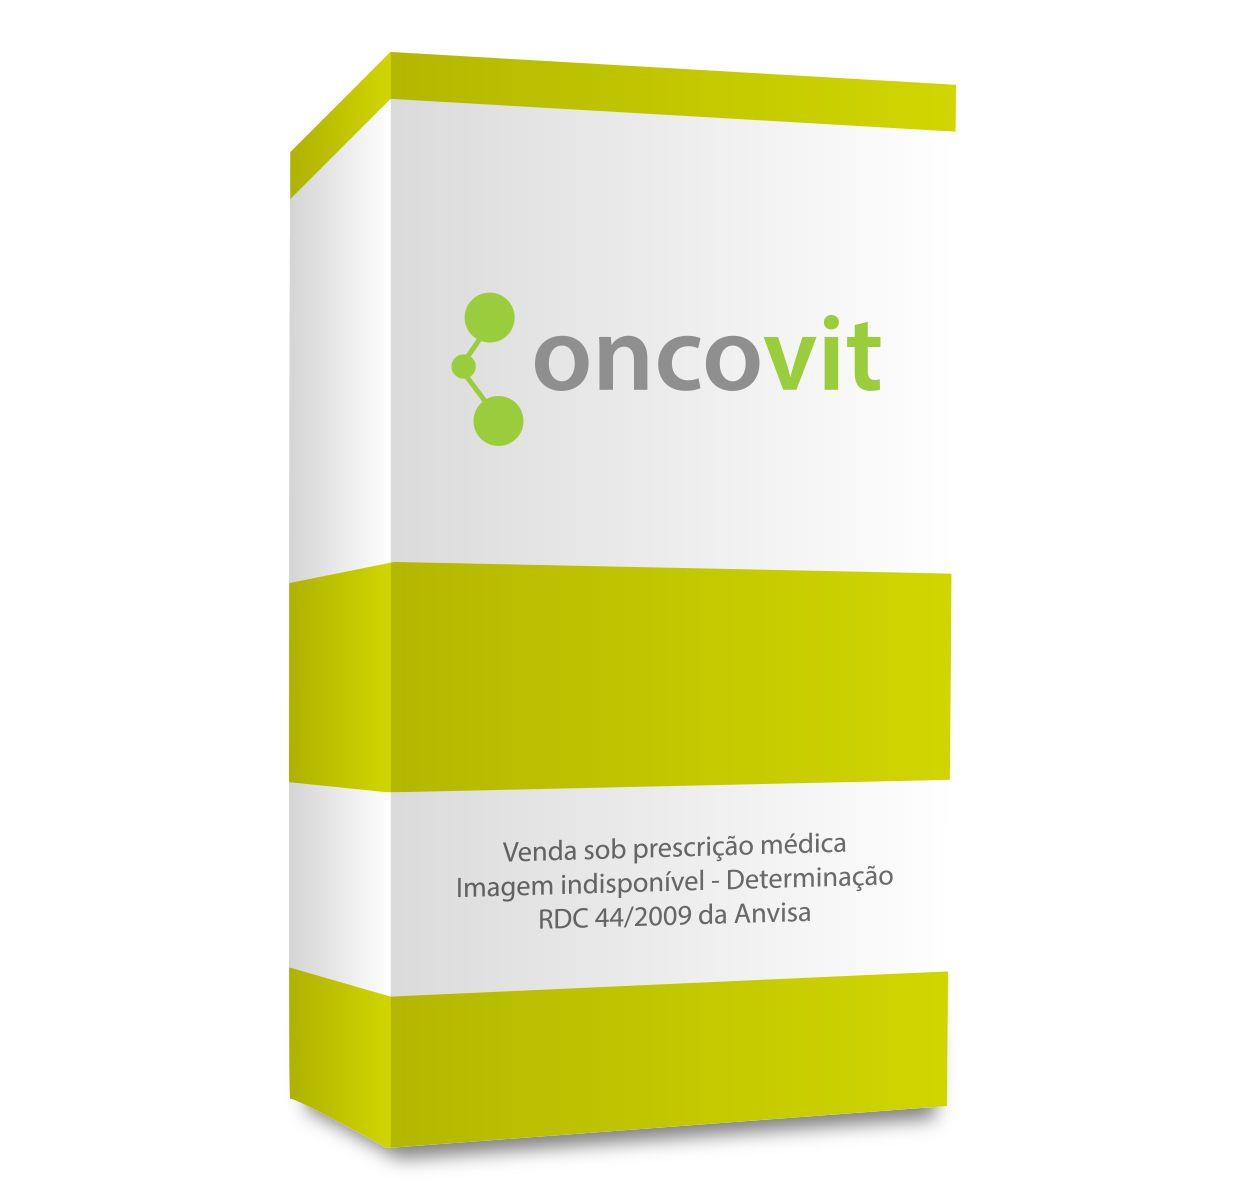 Voriconazol - Accord Farma 50mg, caixa contendo 14 comprimidos revestidos